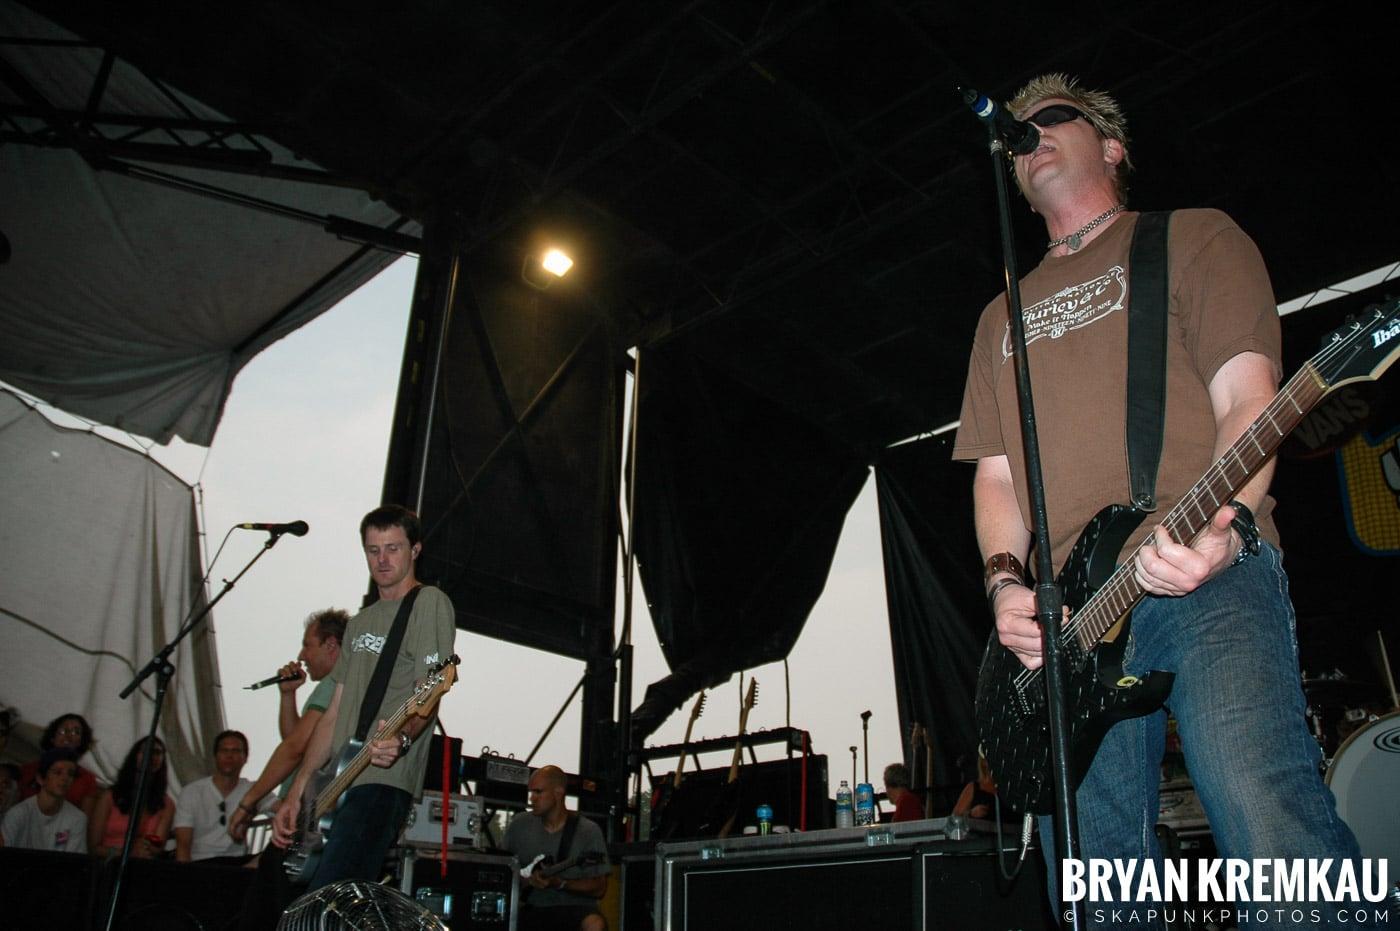 The Offspring @ Warped Tour 05, NYC - 8.12.05 (12)